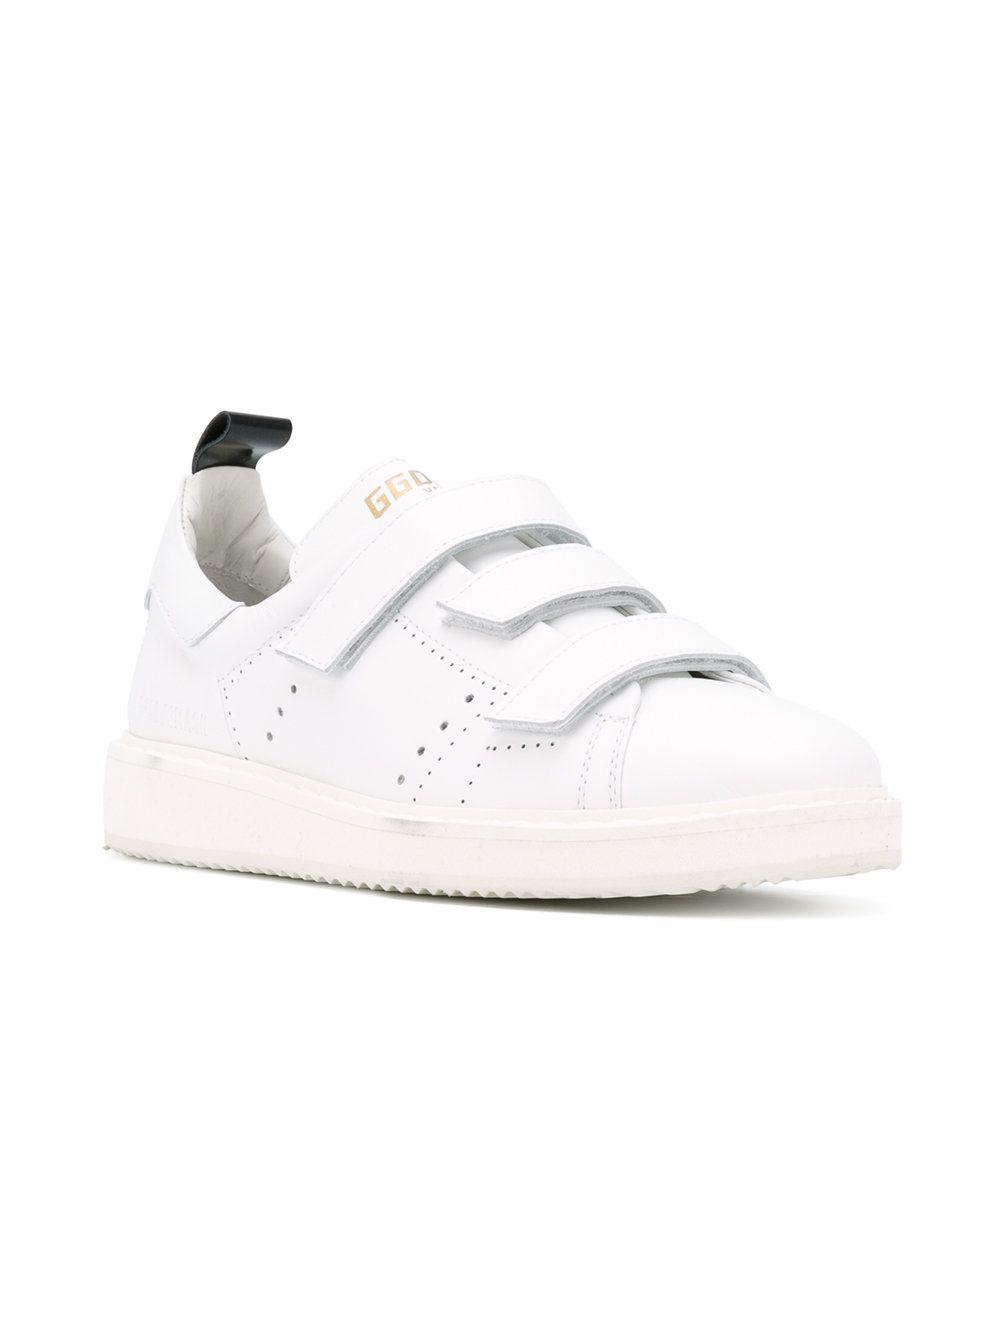 fermeture scratch scratch adidas chaussures fermeture femme adidas chaussures femme zUVpqSMG